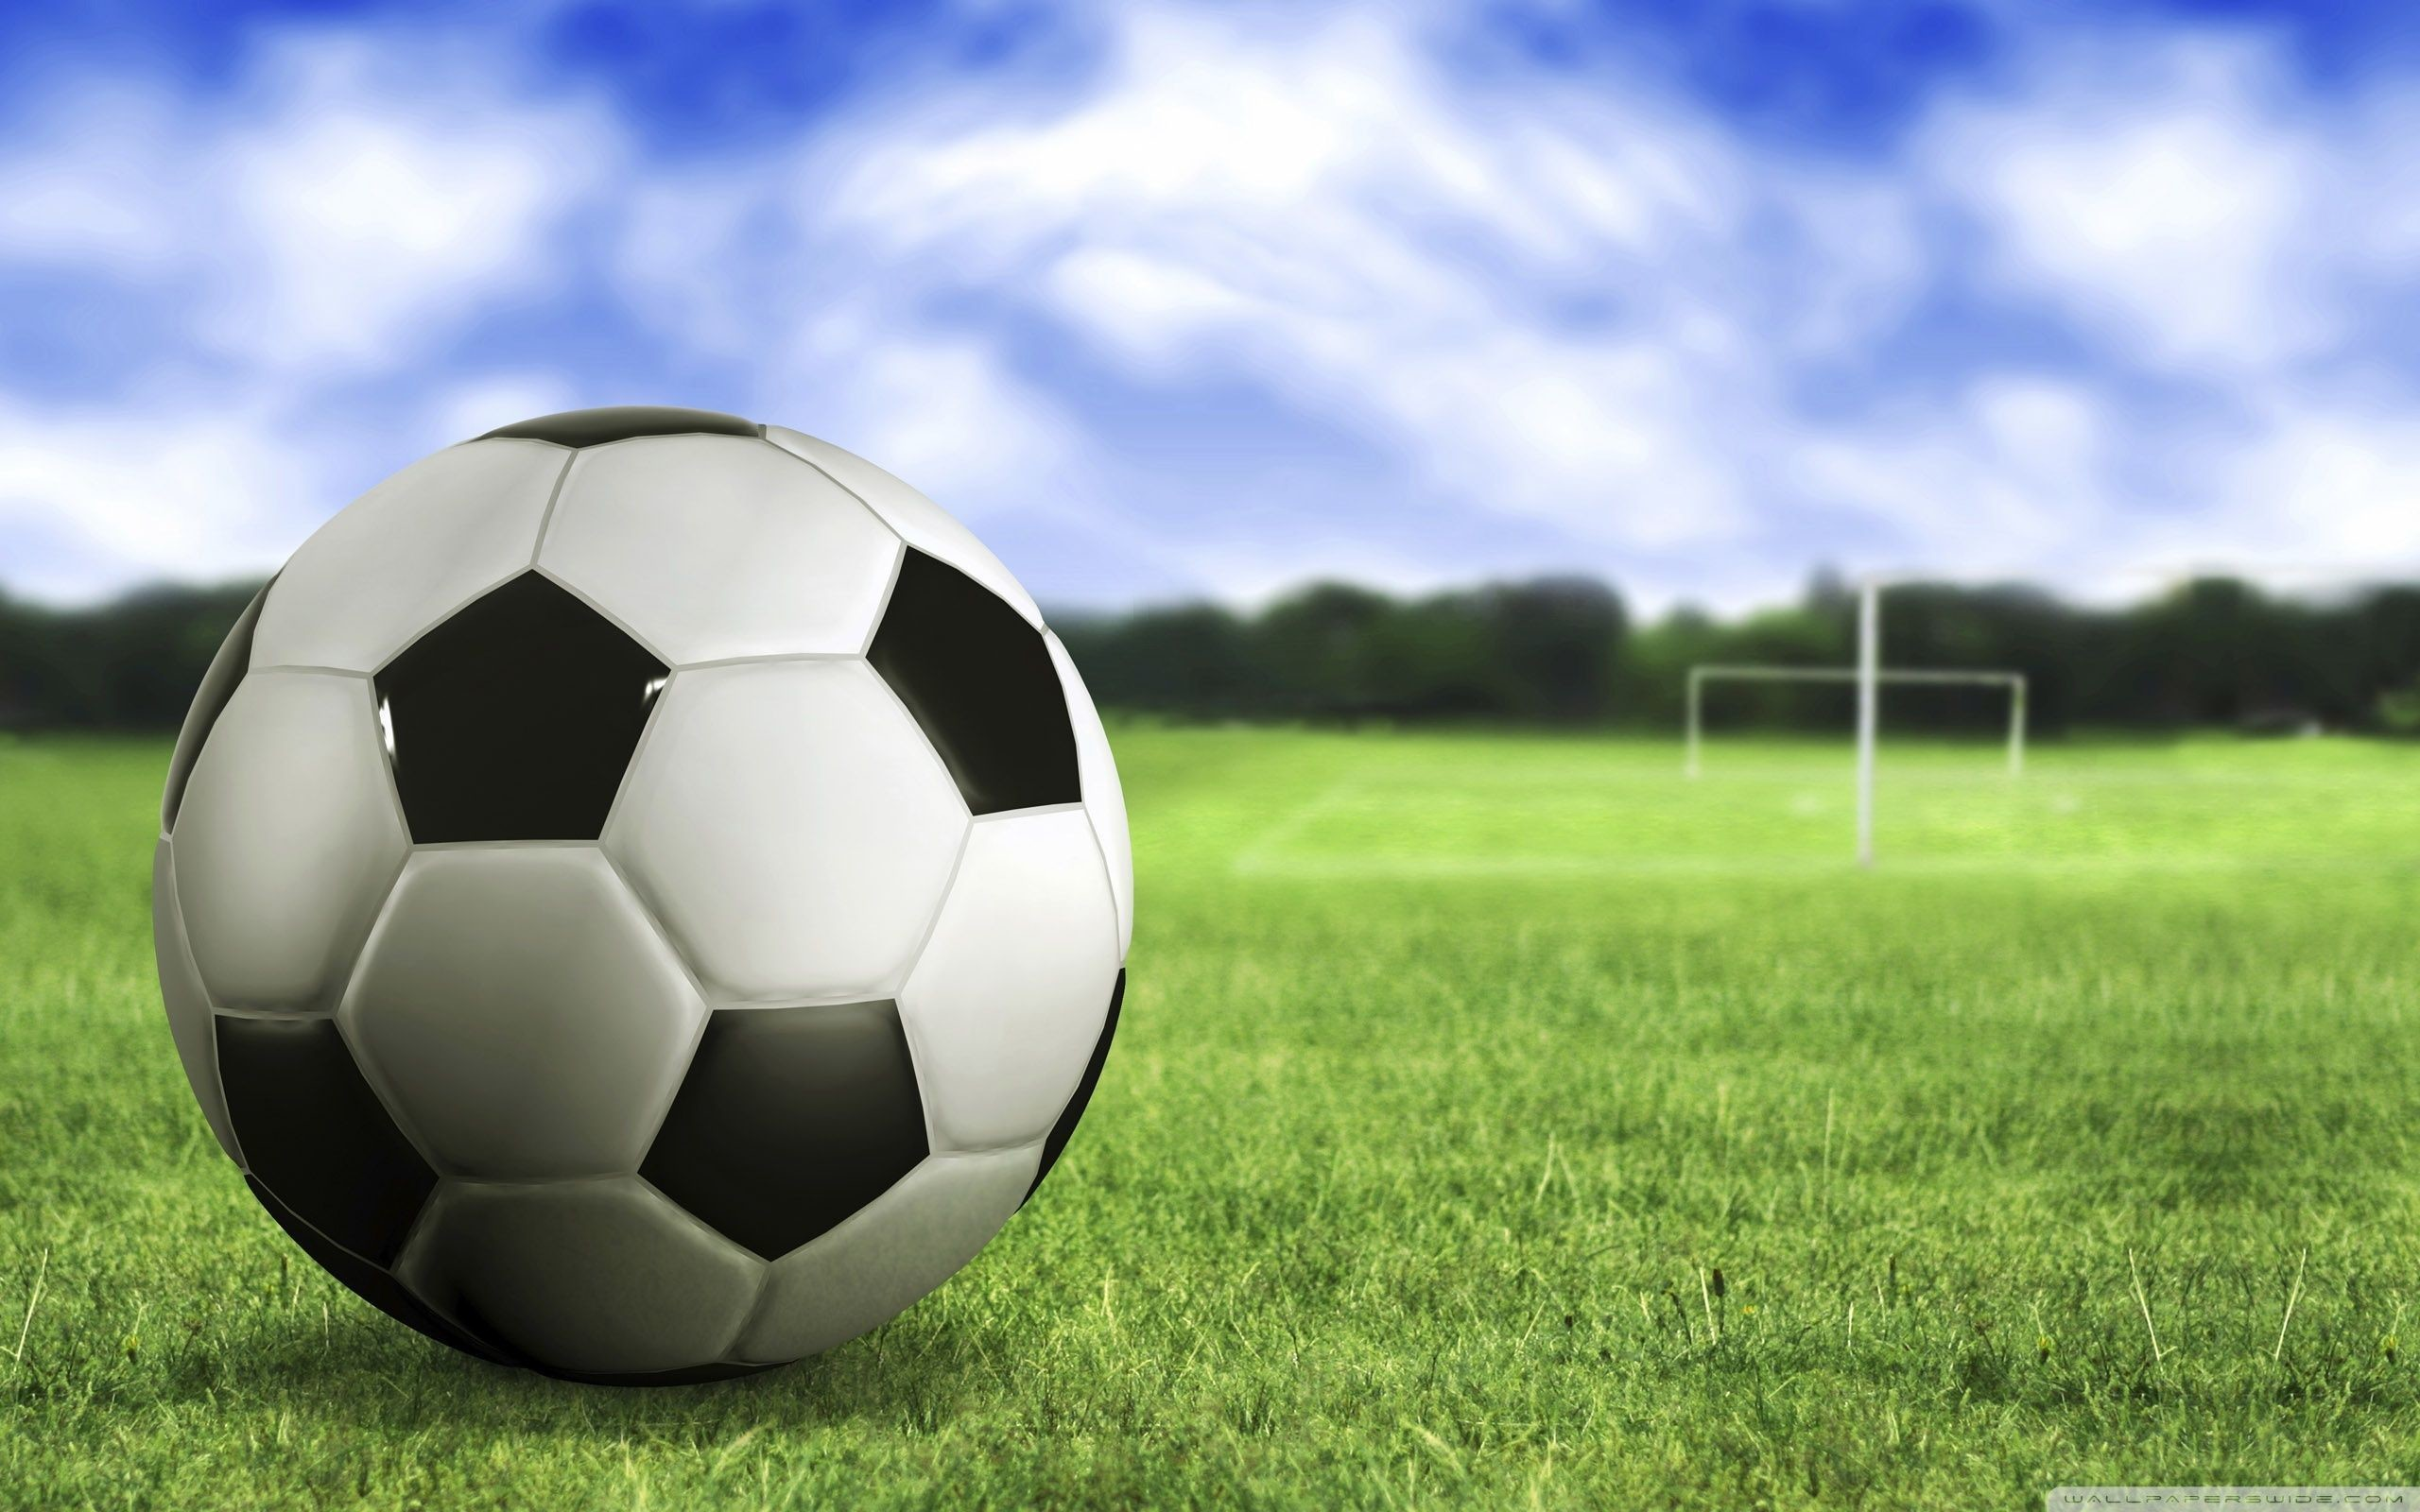 Soccer Field Wallpaper: Football Field Wallpapers ·① WallpaperTag